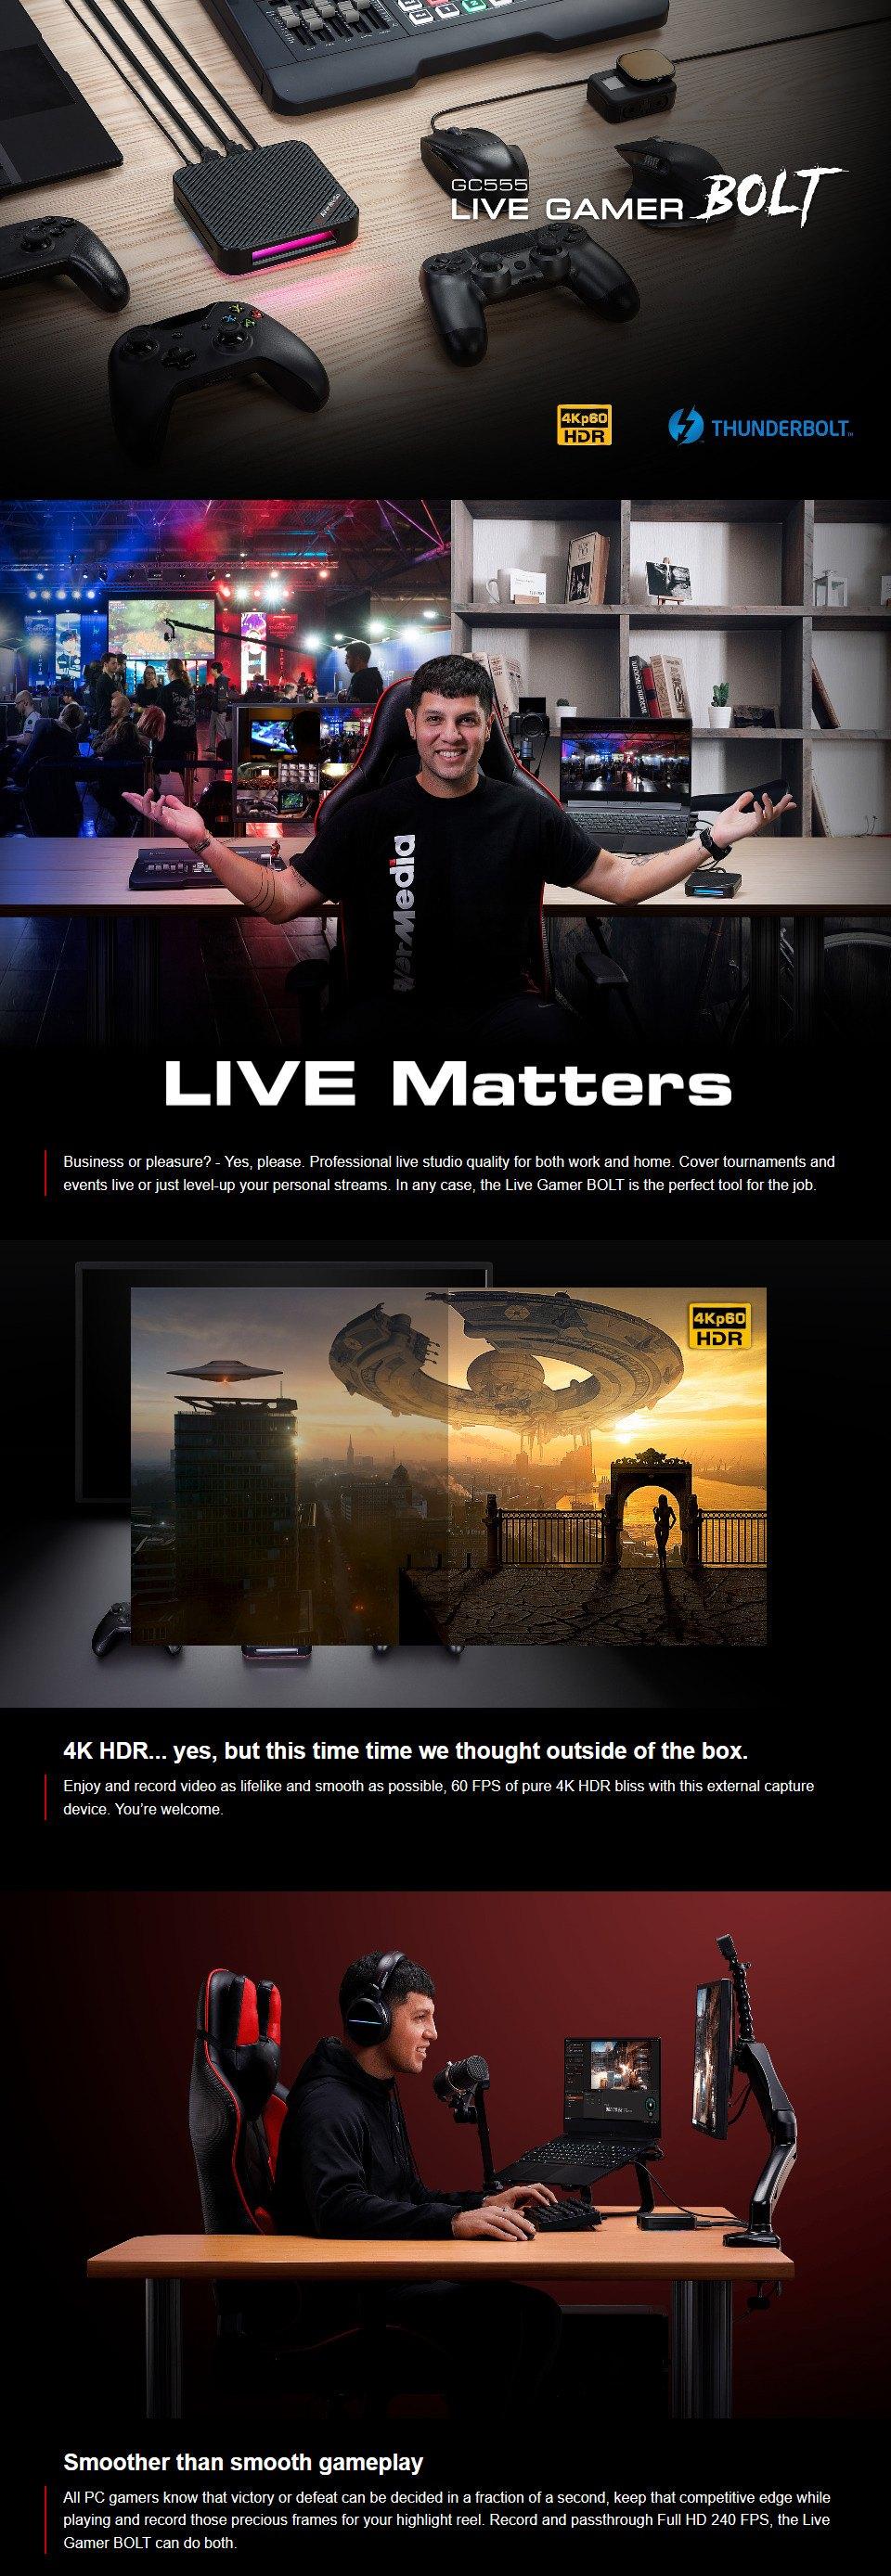 AVerMedia GC555 Live Gamer BOLT TB3 Capture Card features